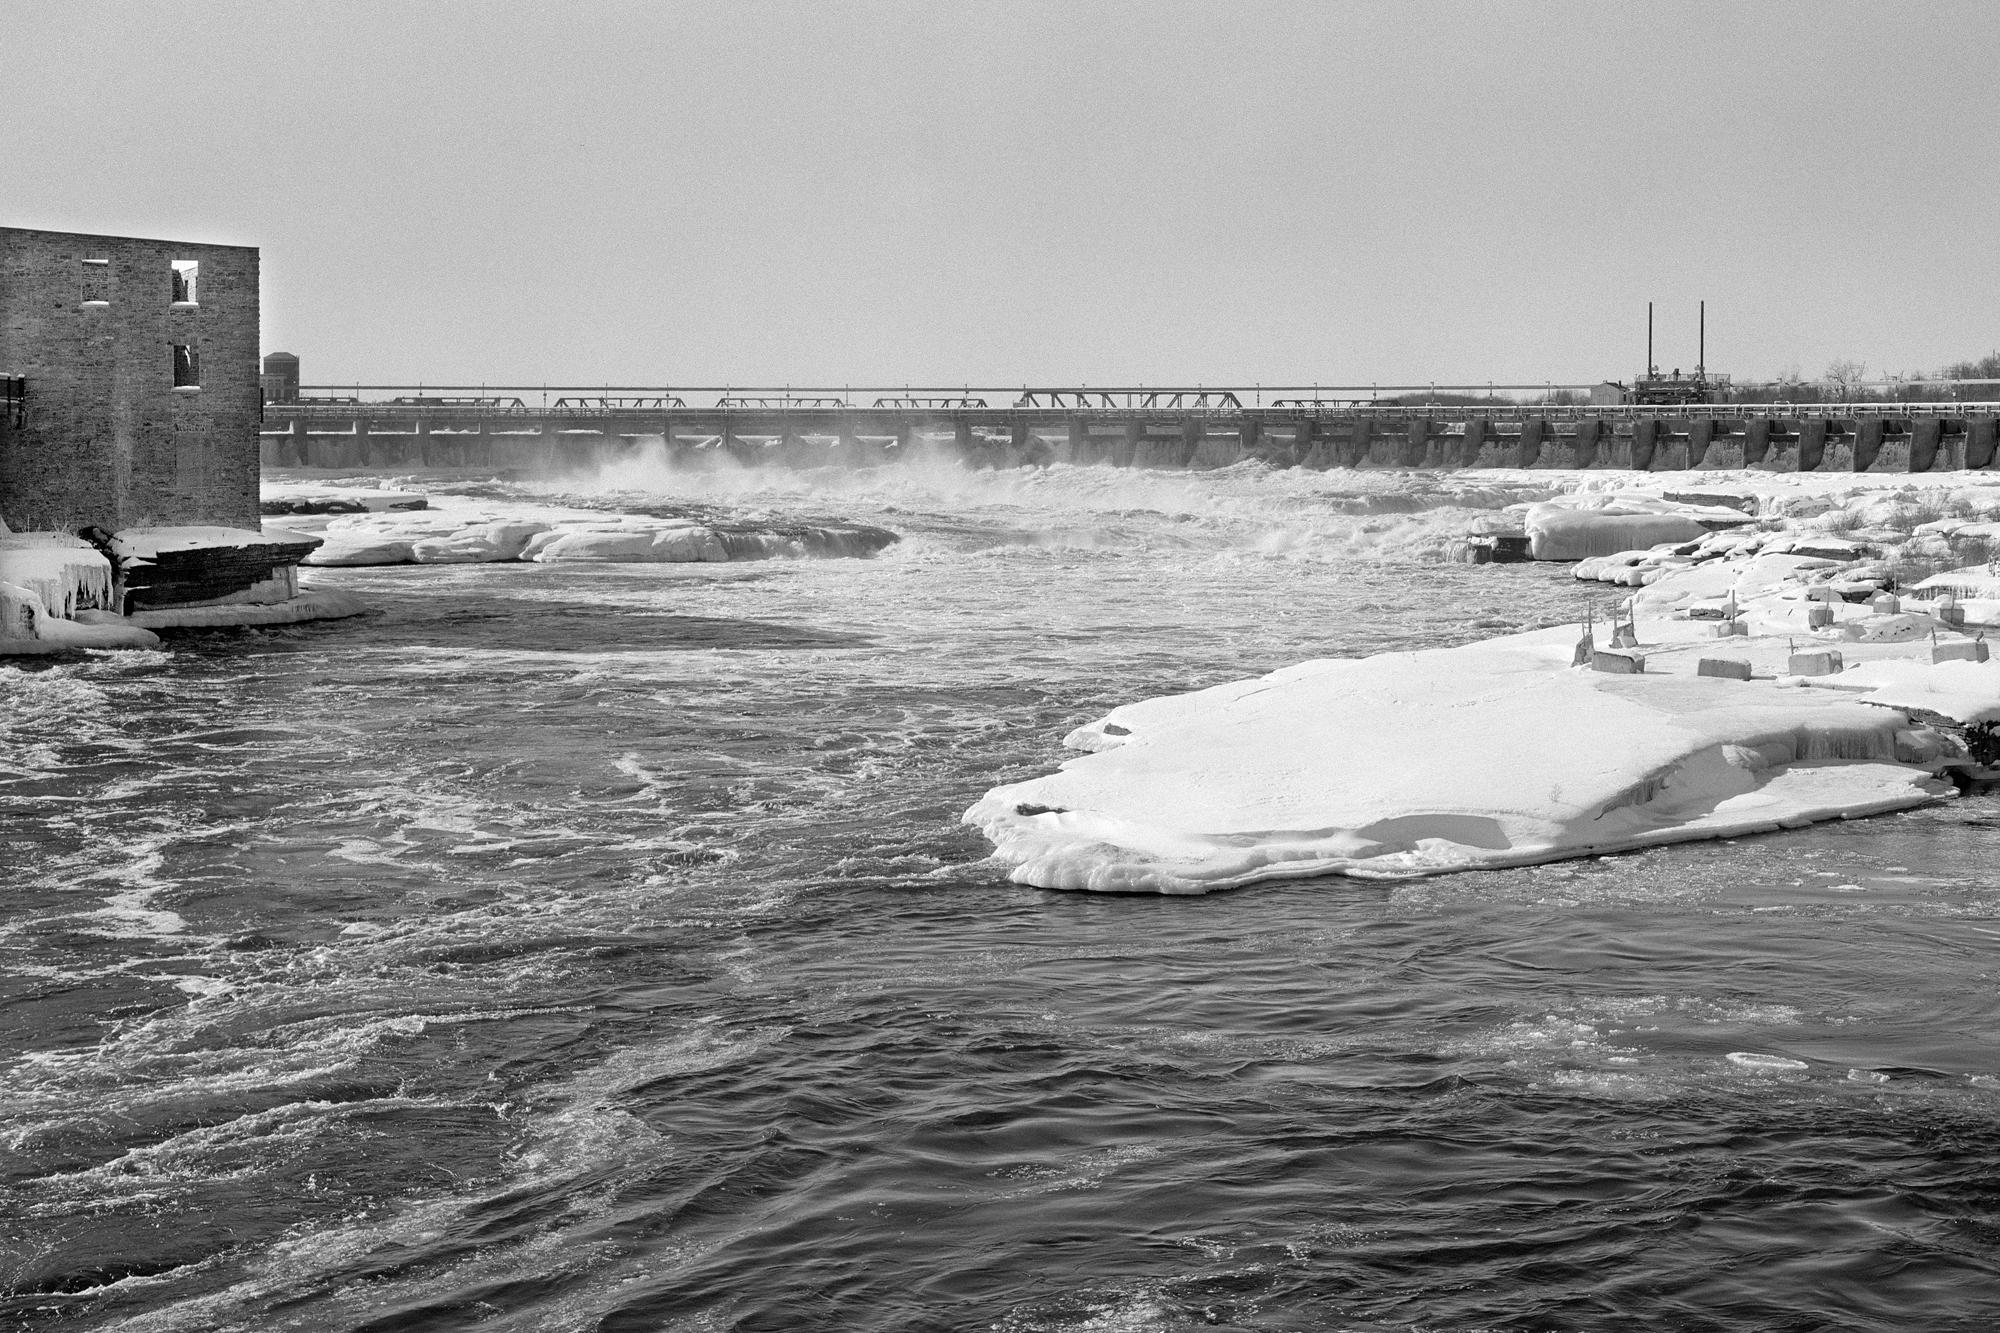 Snowy banks of river (Pic: Howard Sandler)